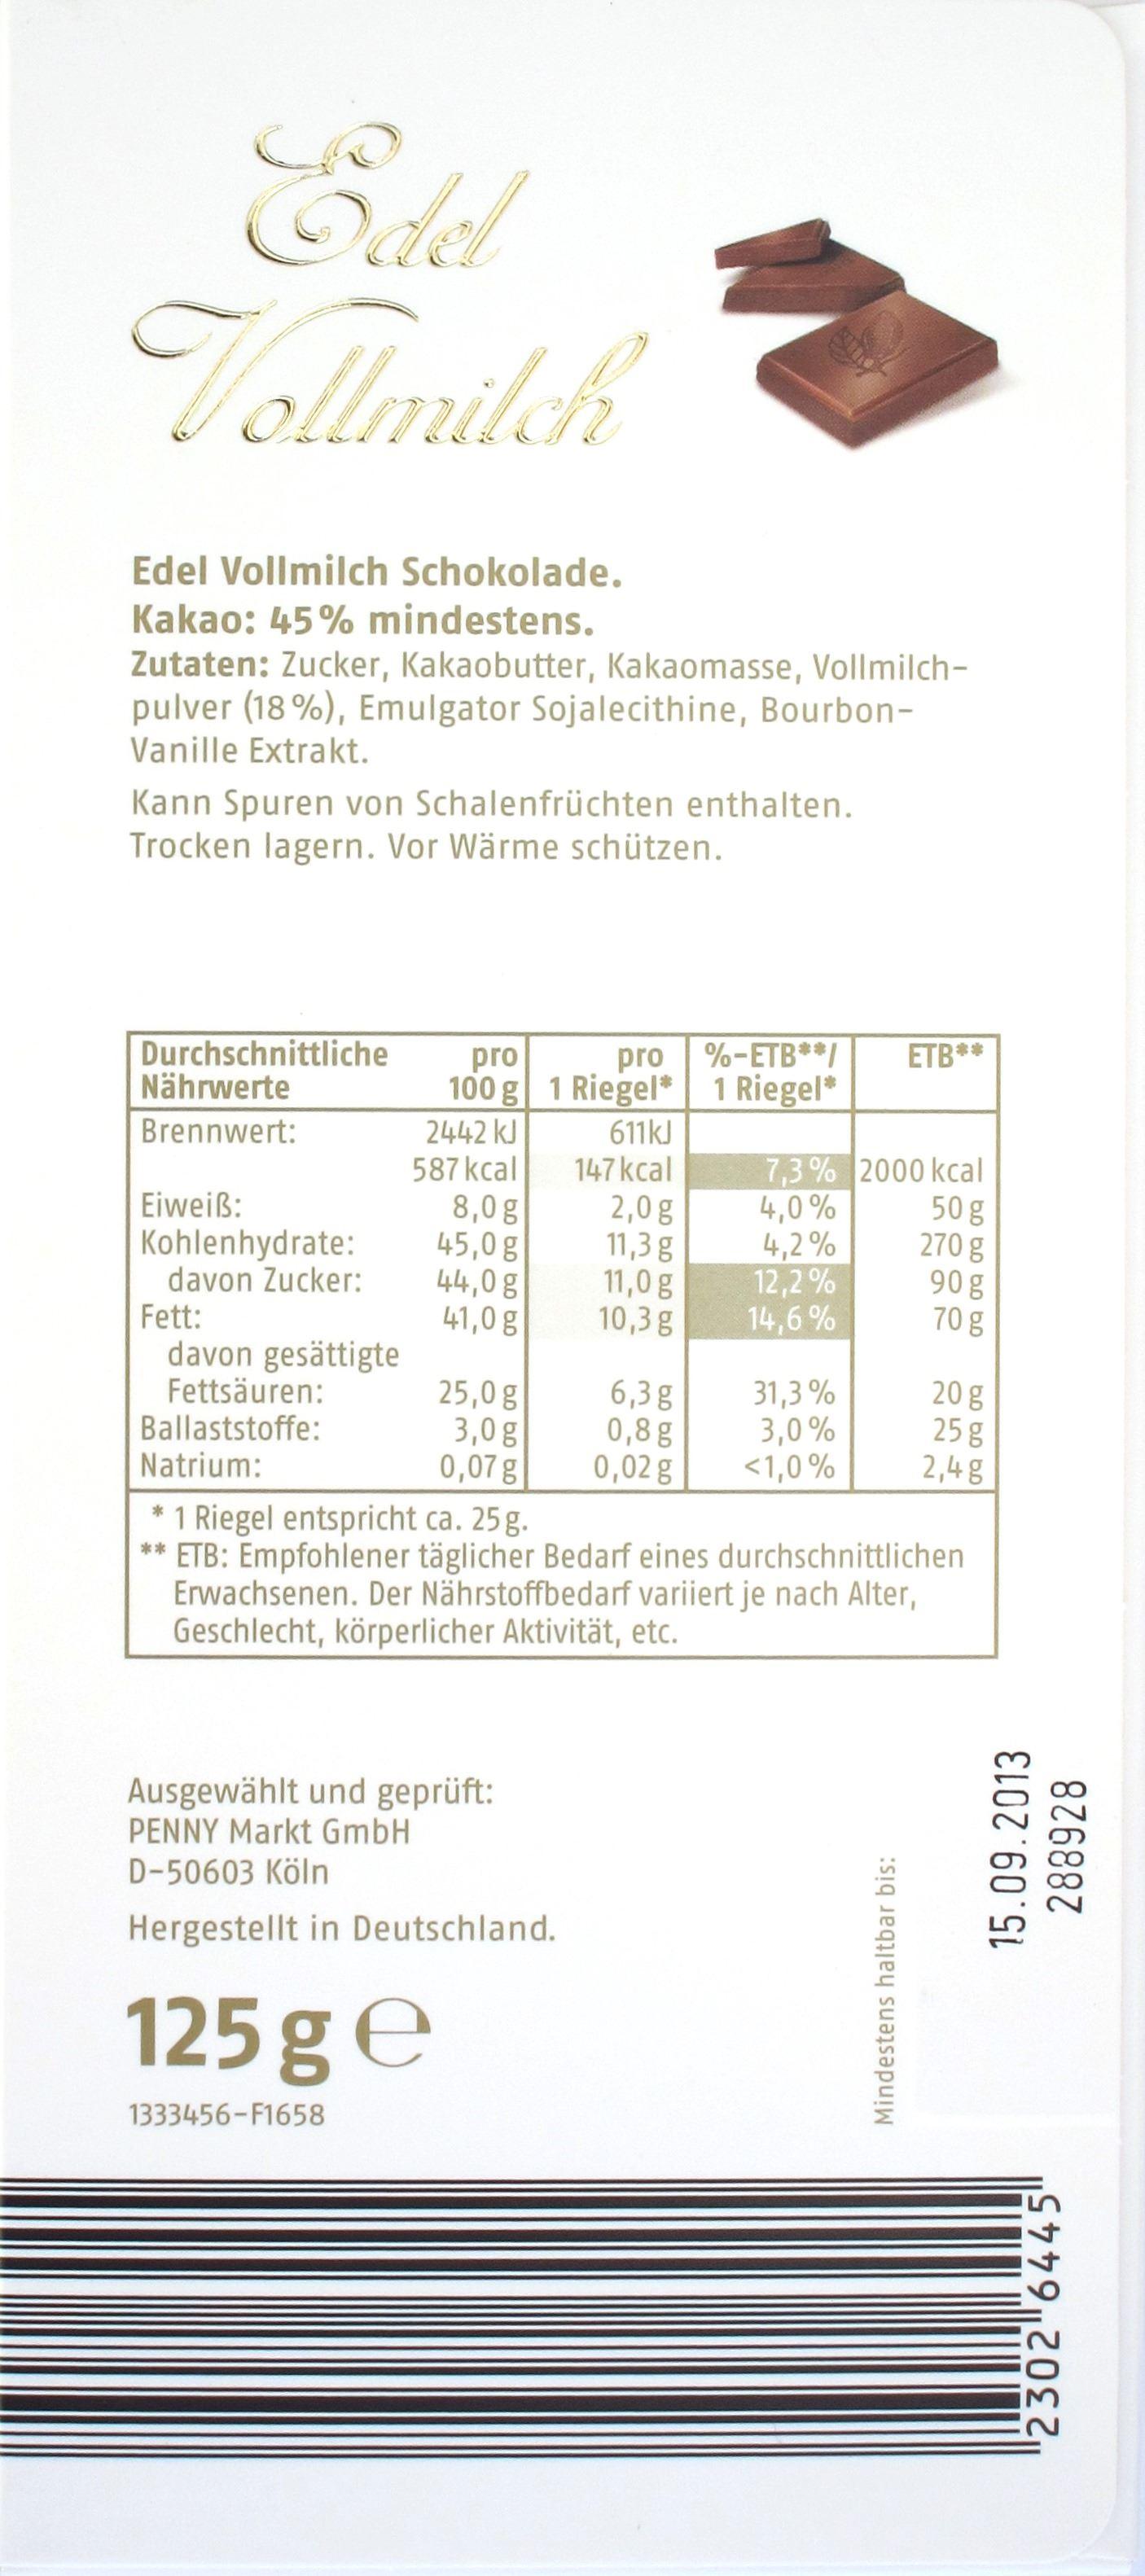 Rückseite: Penny 45% Edel Vollmilchschokolade